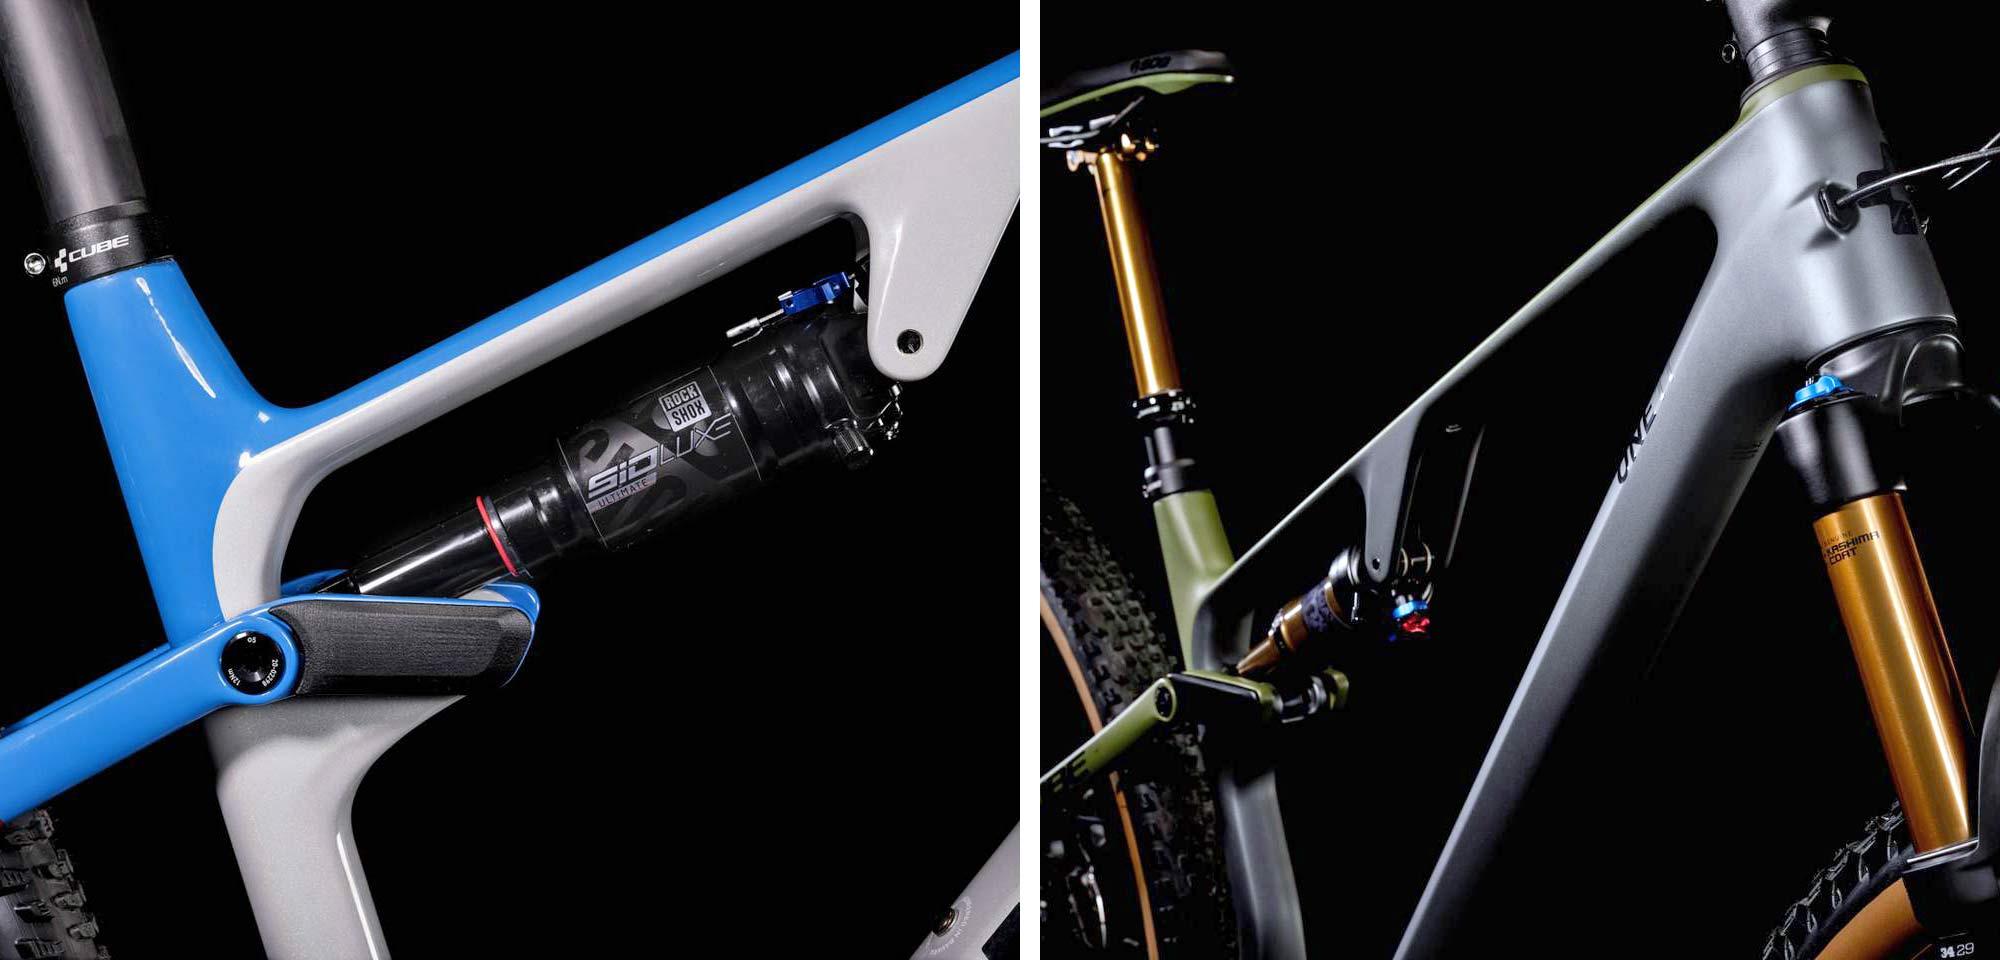 All-new 2022 Cube AMS lightweight C:68X carbon XC Marathon Trail mountain bikes,shock details